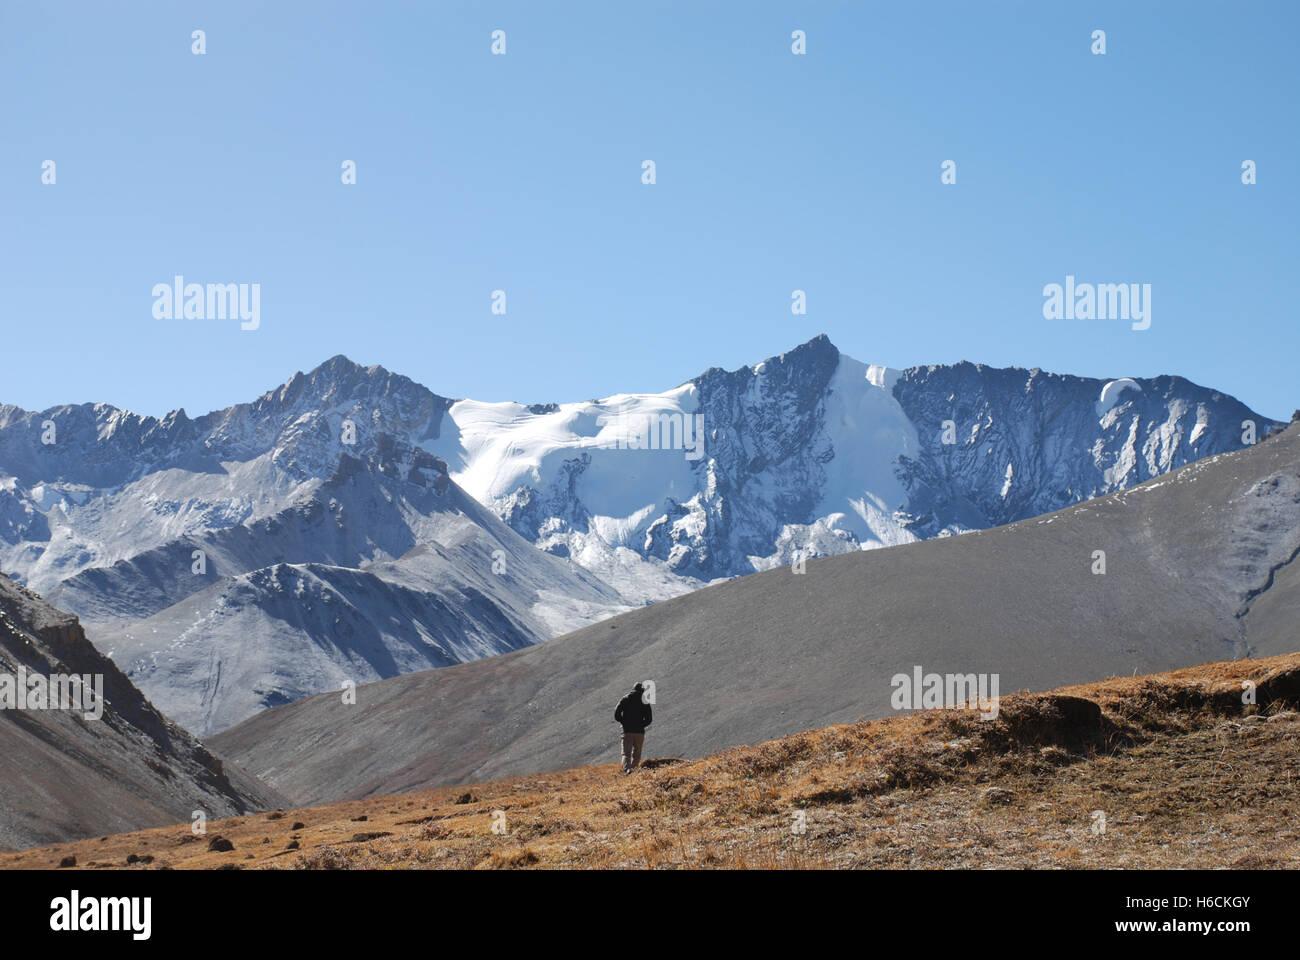 the high himalayan peaks in the remote Damodar Himal  Mustang region of Nepal - Stock Image